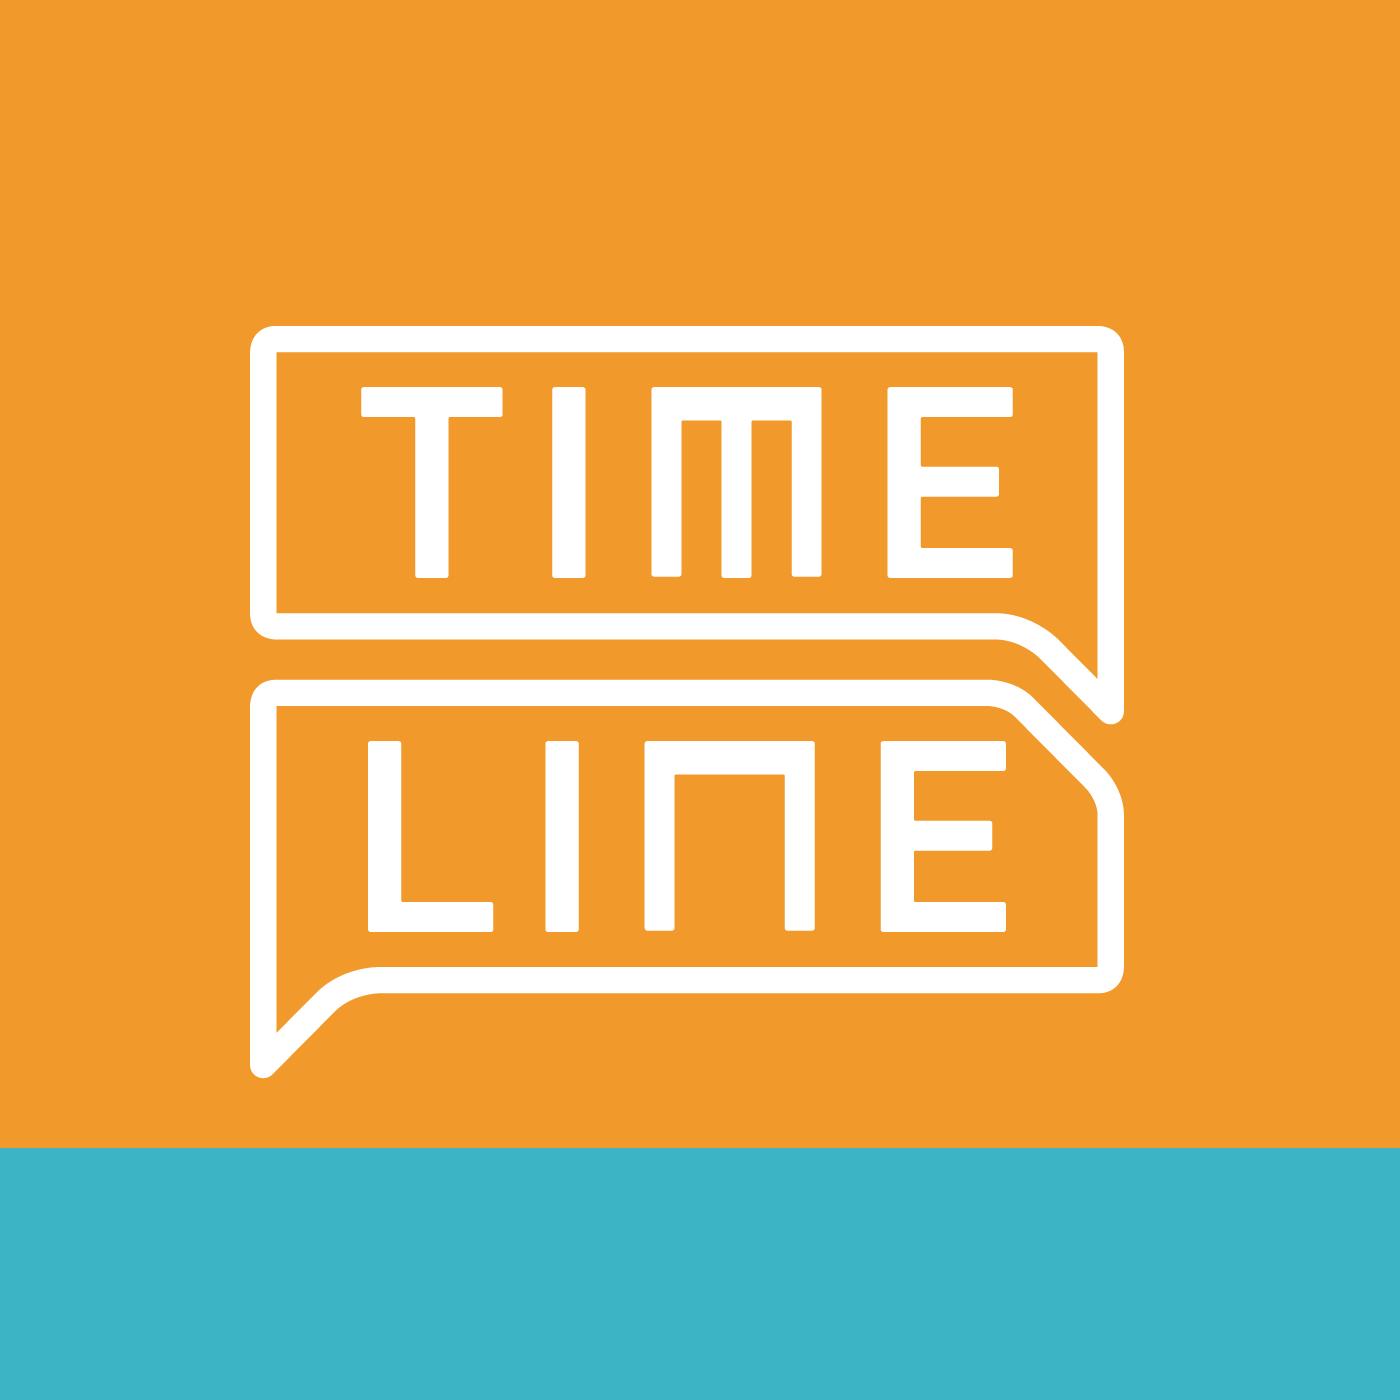 Timeline Gaúcha 16/11/2017